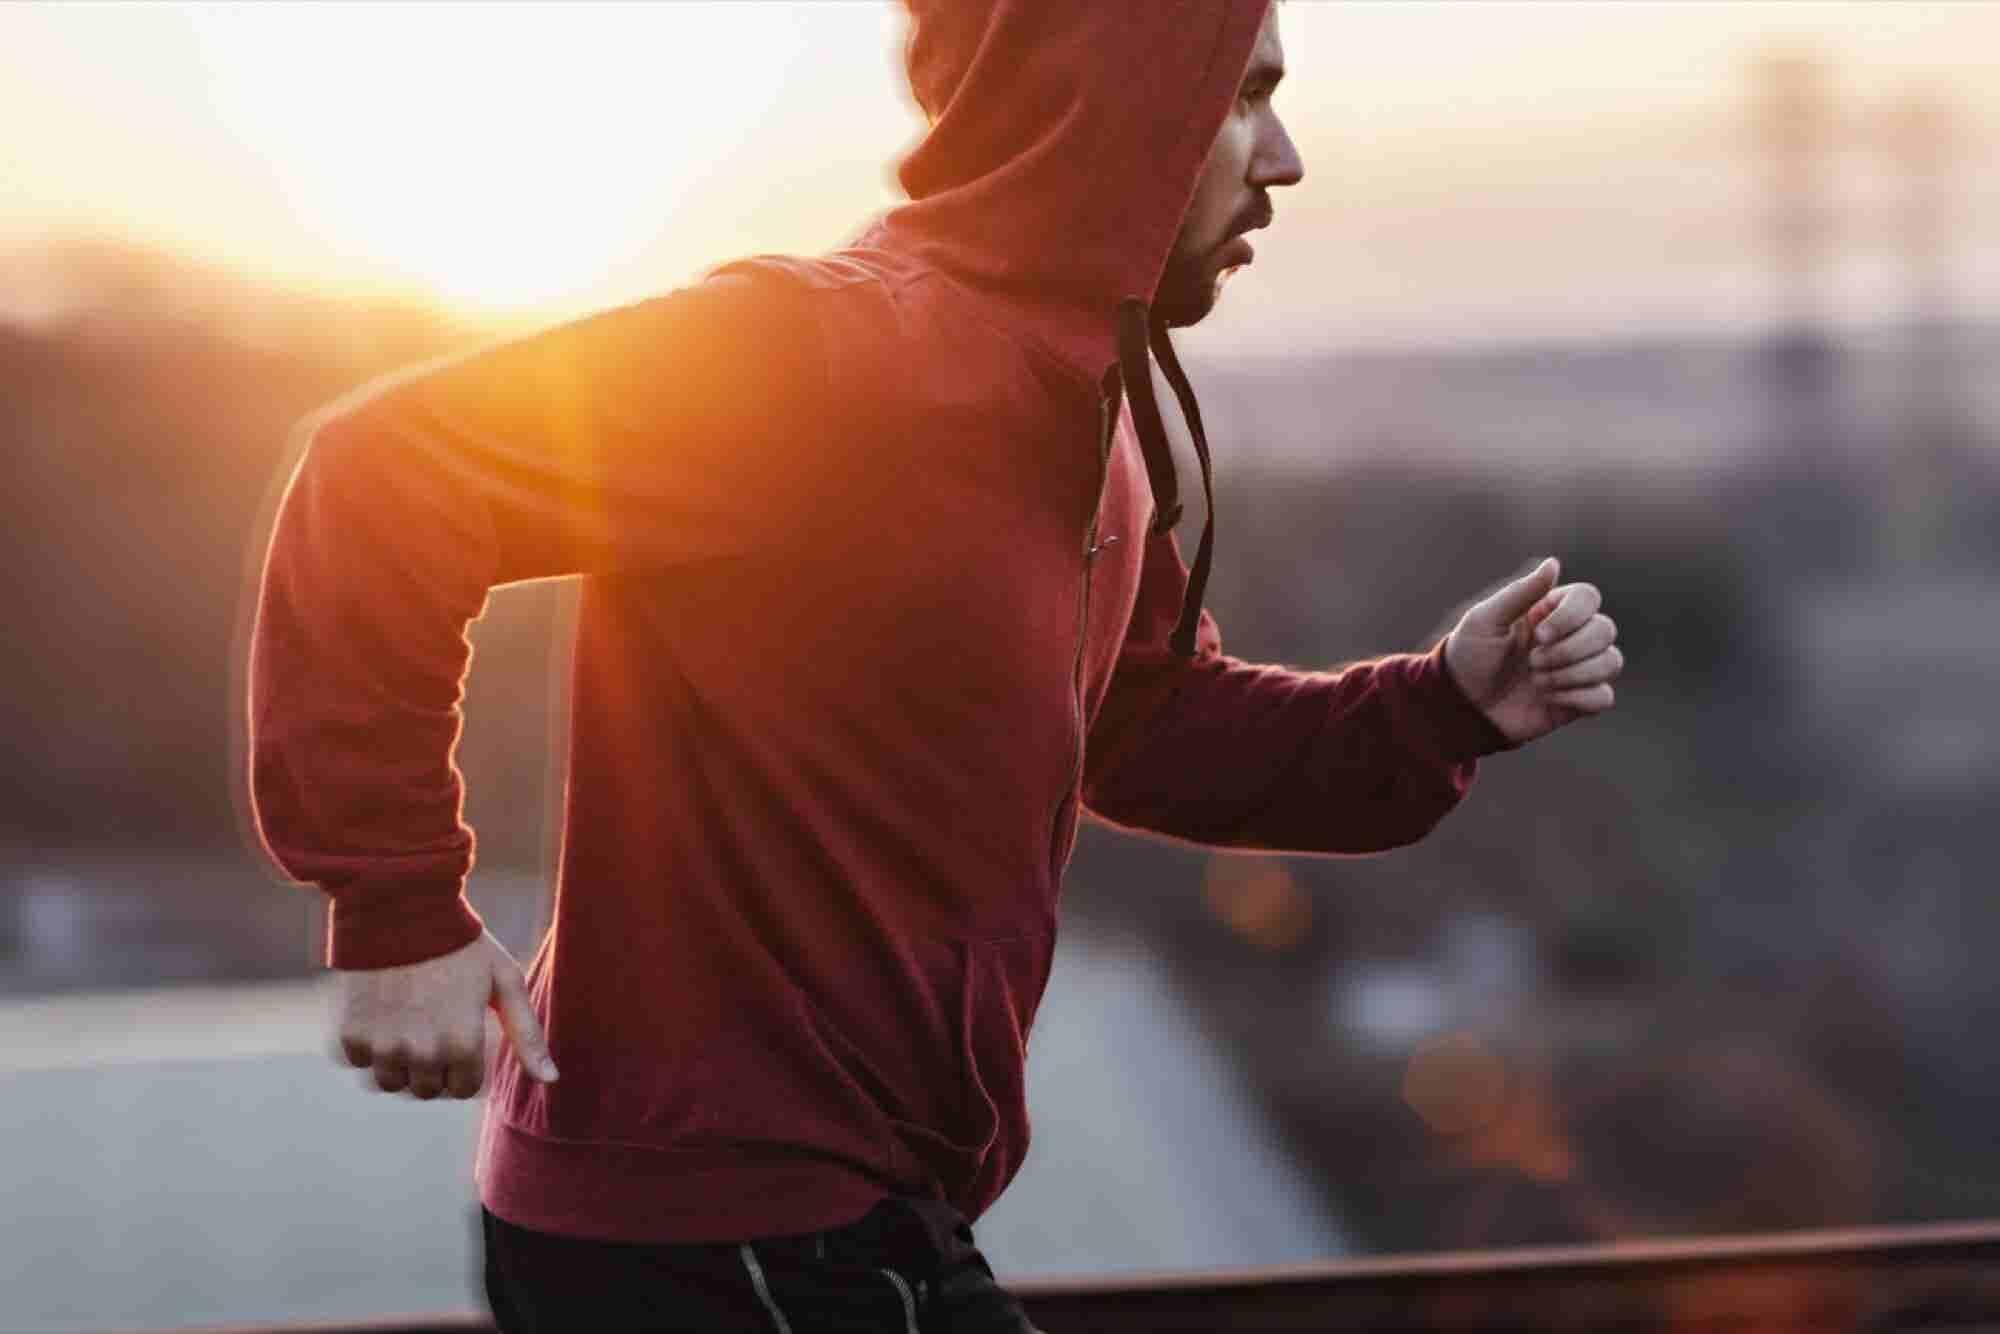 10 Top Entrepreneurs Reveal Their Health Regimen Secrets